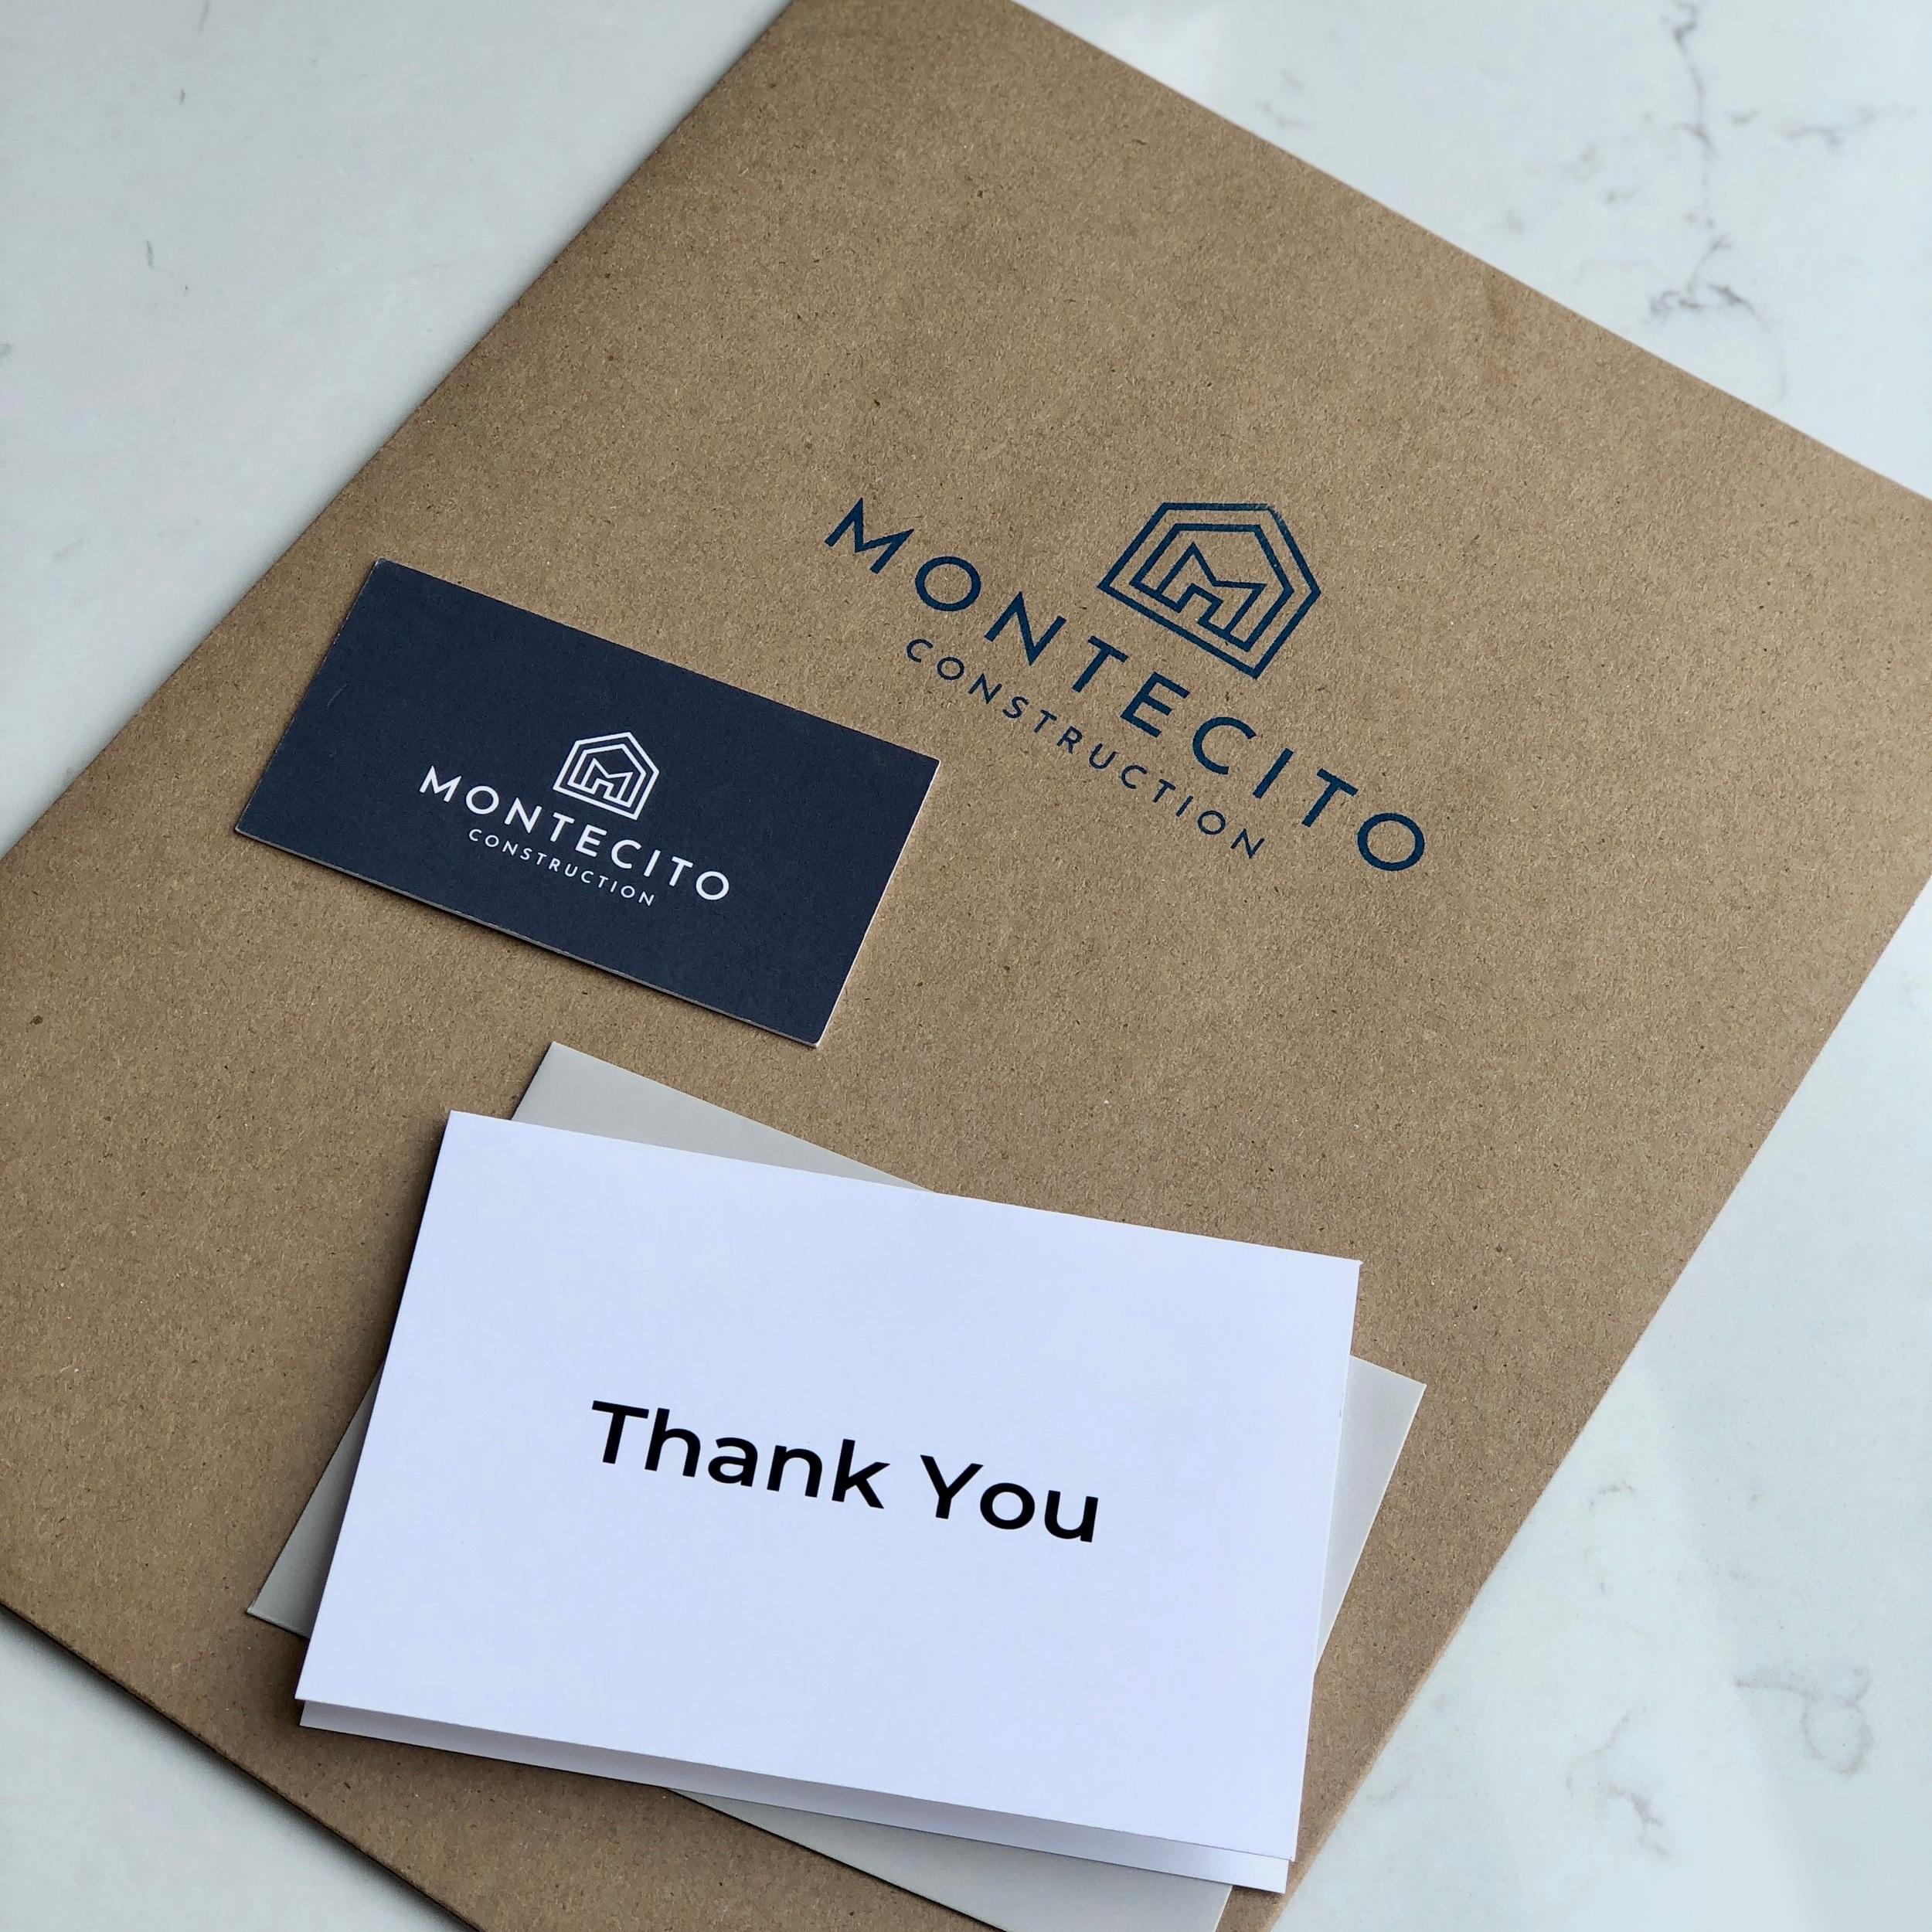 montecito-construction-branding.jpg